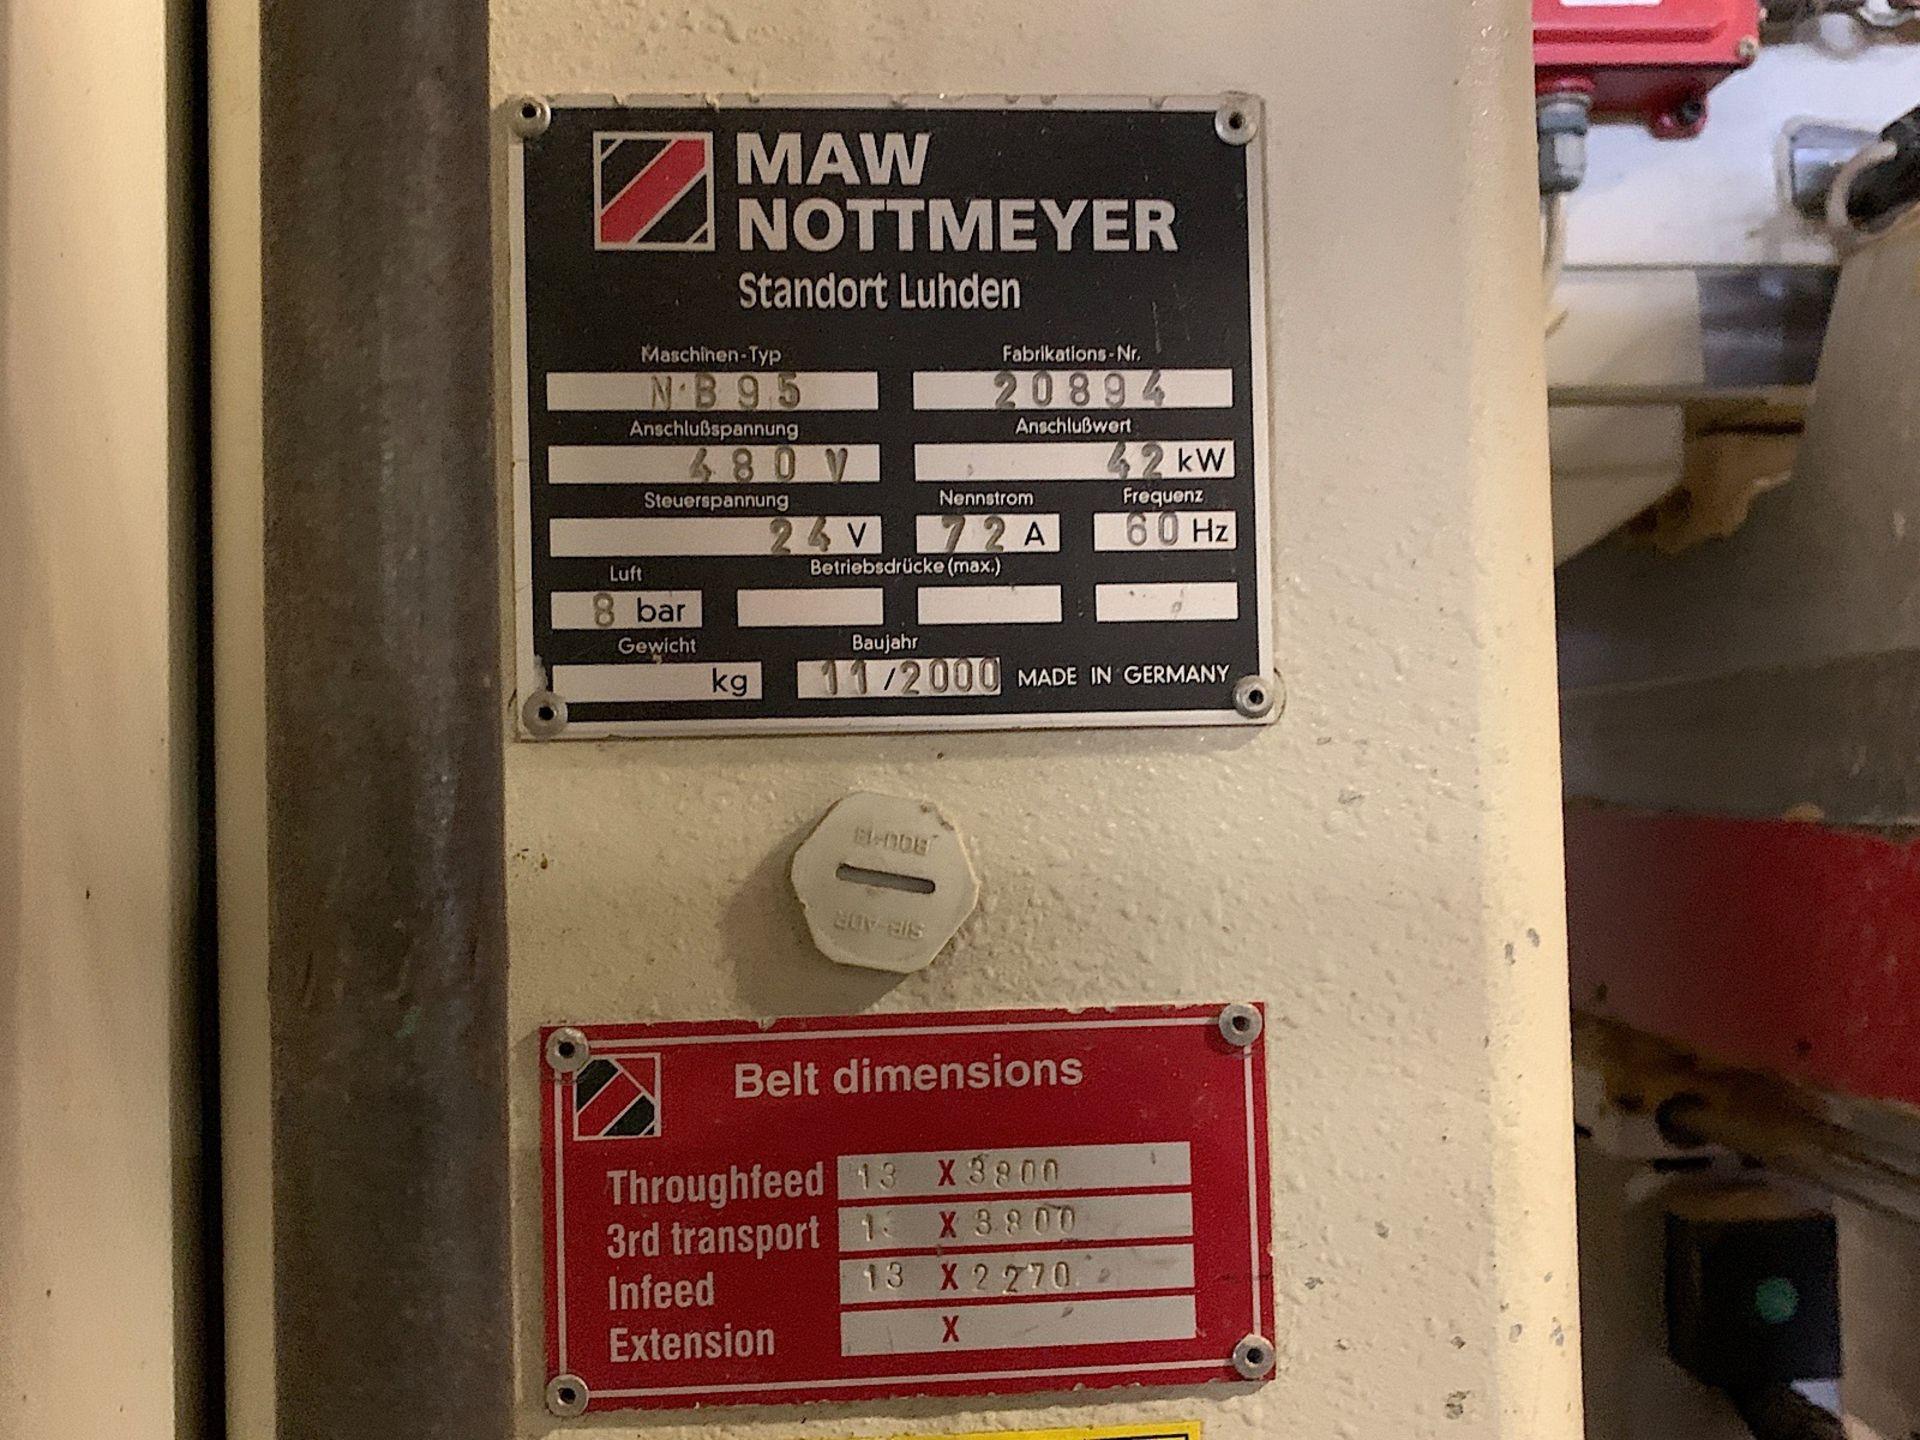 Lot 12 - IMA NOTTMEYER (NB 95) FEED THROUGH DRILLING MACHINE